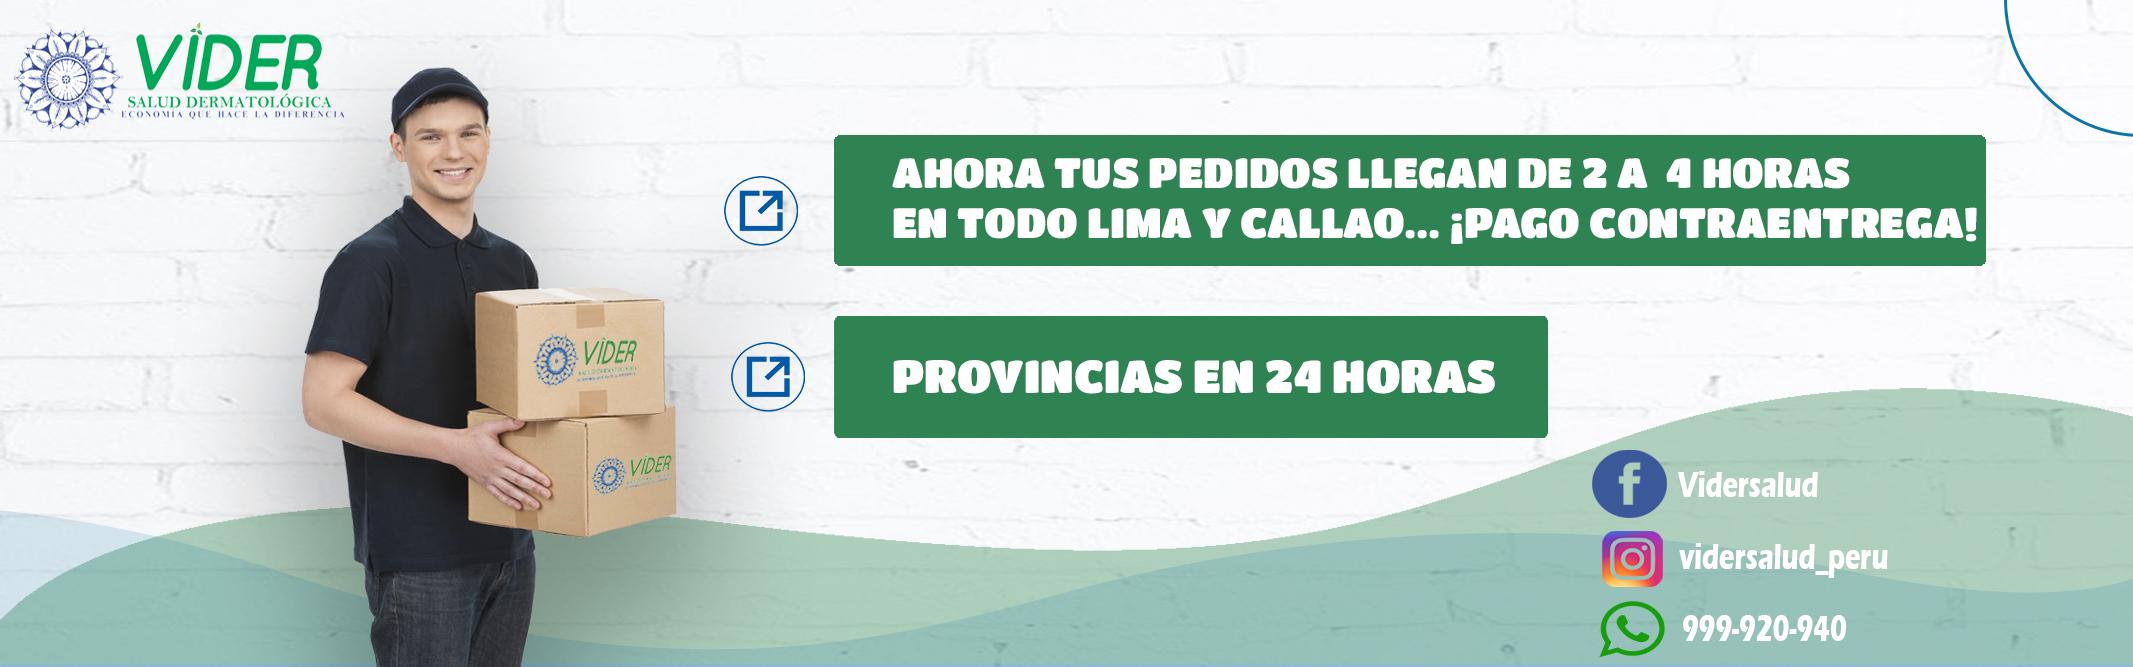 Heliocare - Vider Salud Dermatológica